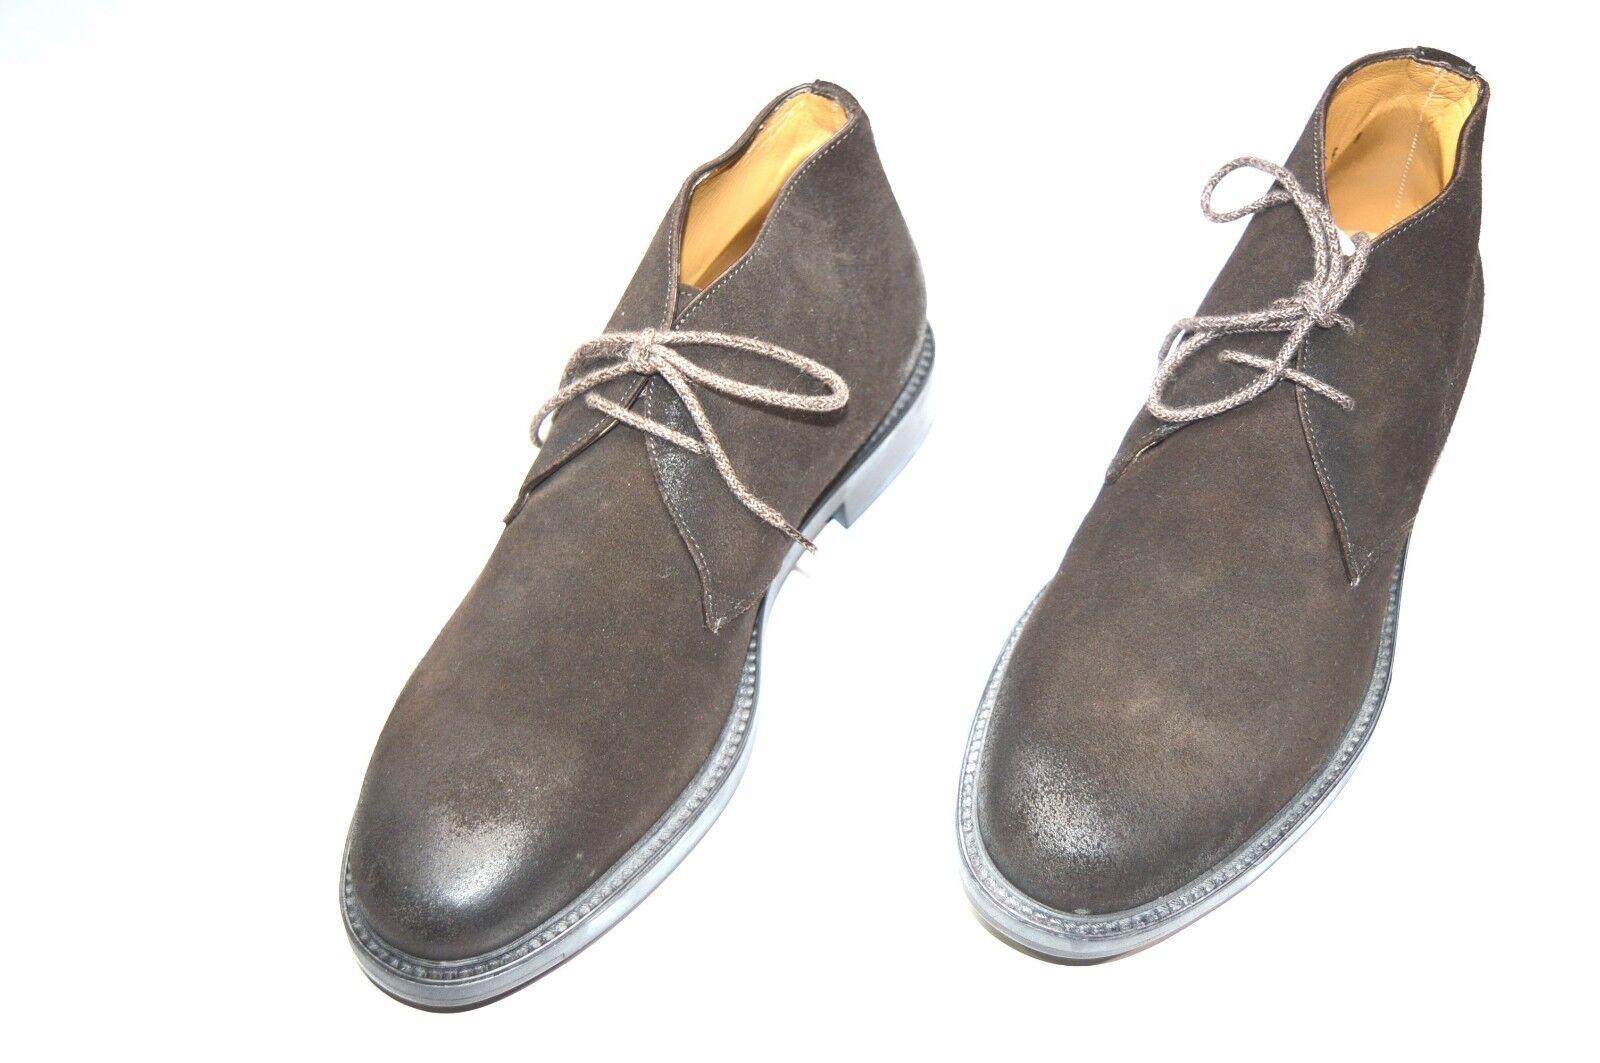 NEW SANTONI Dress Leather Shoes  SIZE Eu 41.5 Us 8.5 (R52)